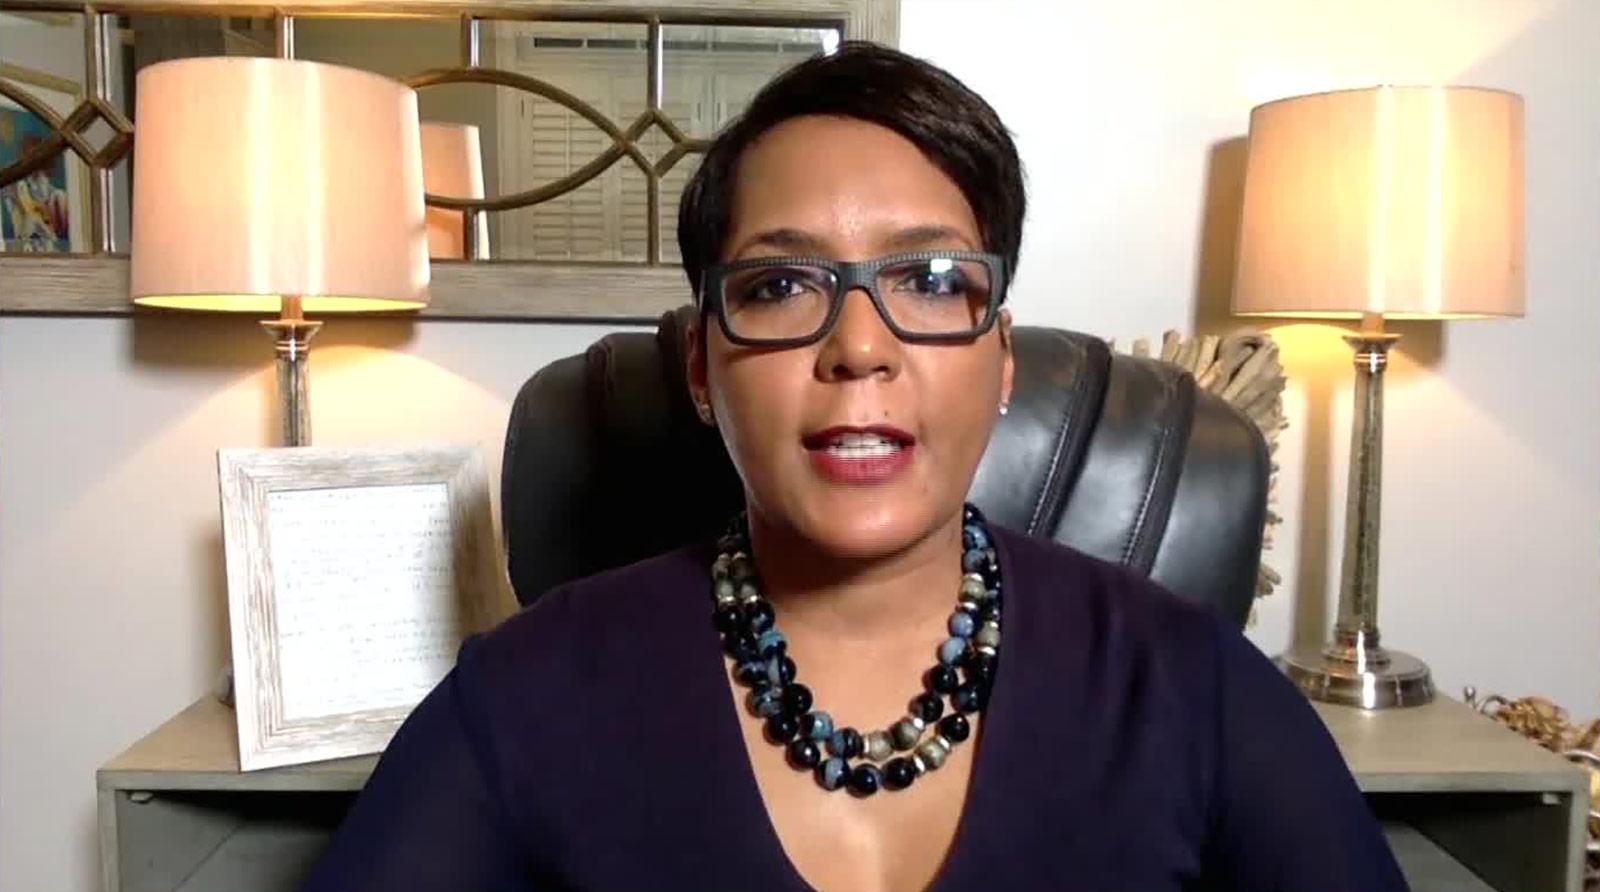 Atlanta Mayor Keisha Lance Bottoms speaks with CNN on Friday, January 22.